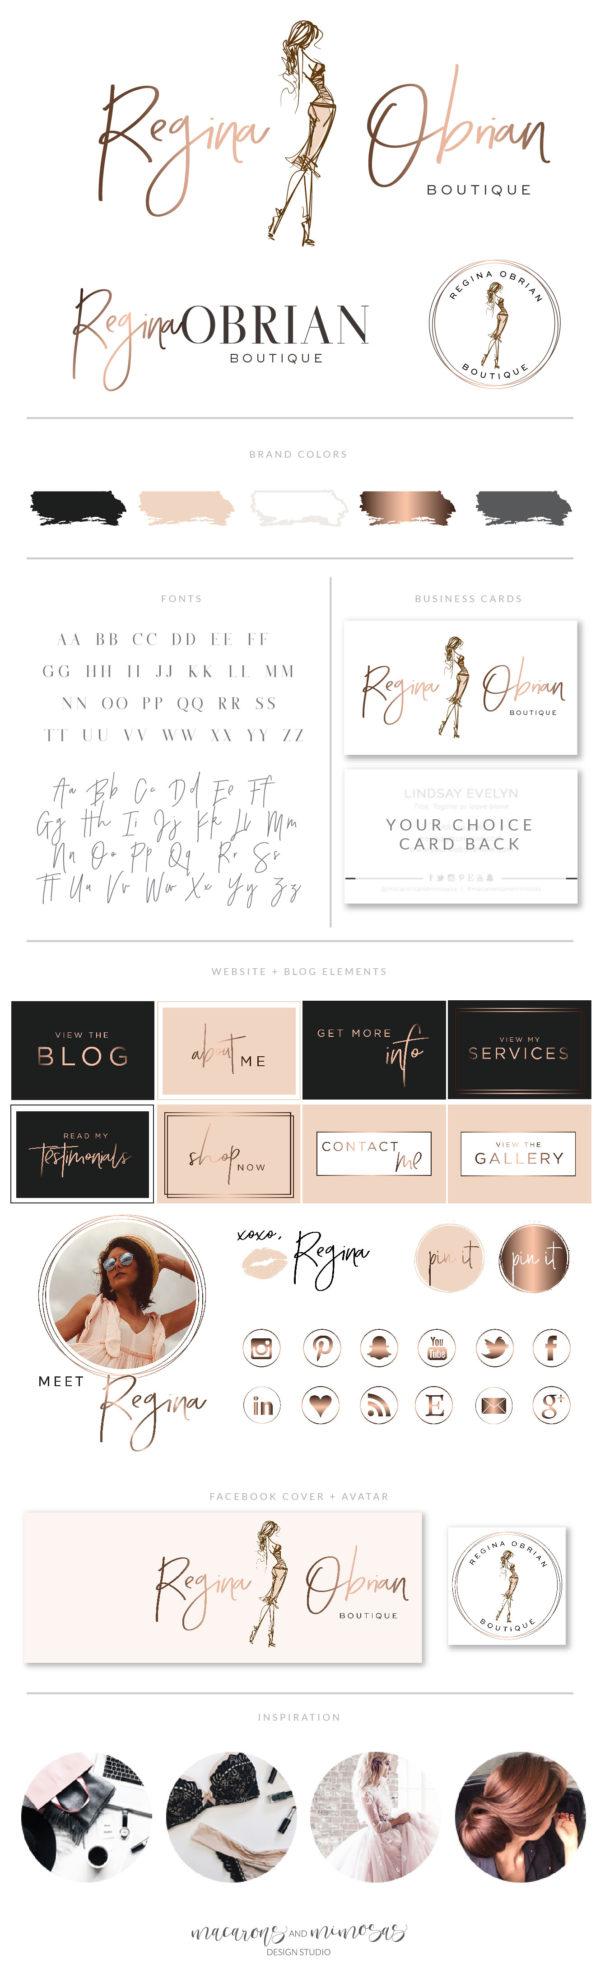 Fashion Logo Design, Fashion Blogger Influencer Branding Kit, Boutique Website Branding Logo Watermark, Premade Girl Fashion Logo